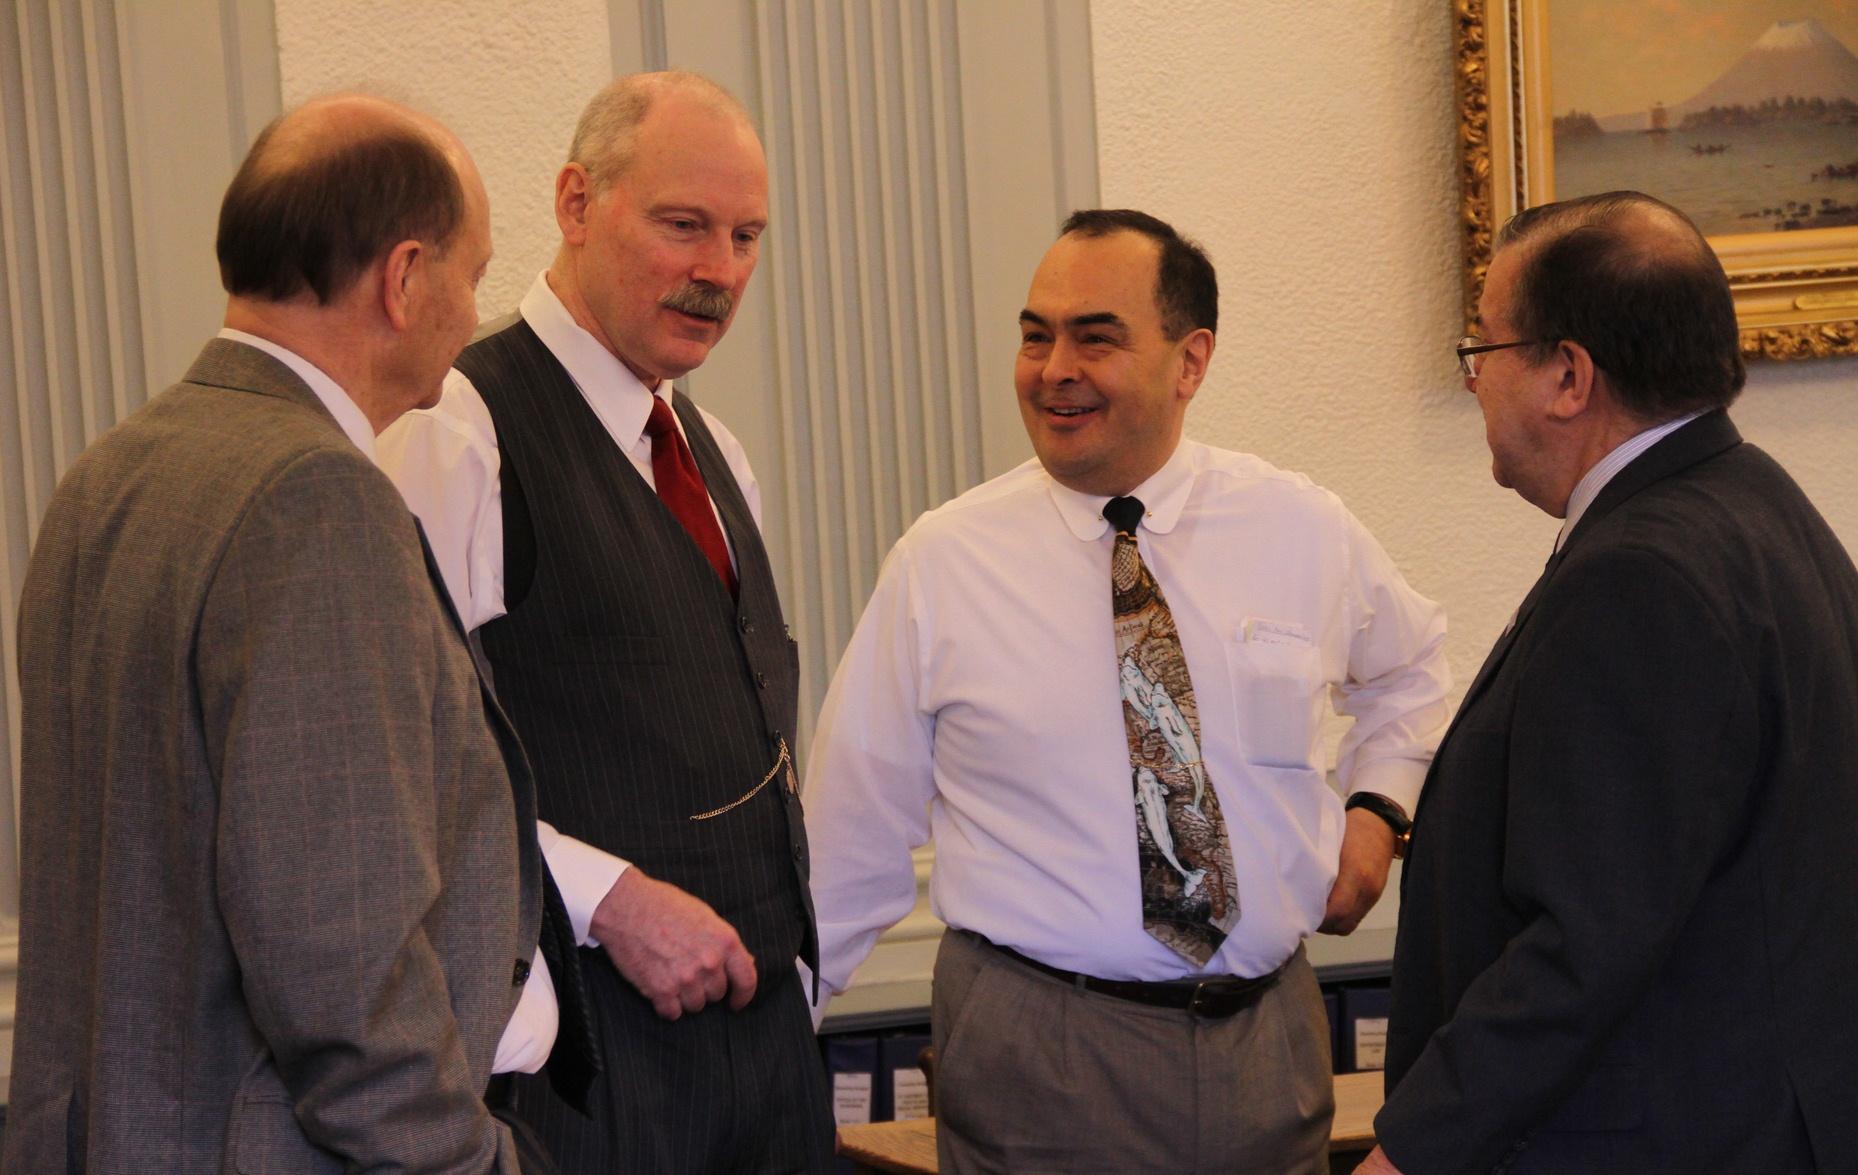 Senate Finance Committee - Senators Thomas, Stedman, Olson and Hoffman